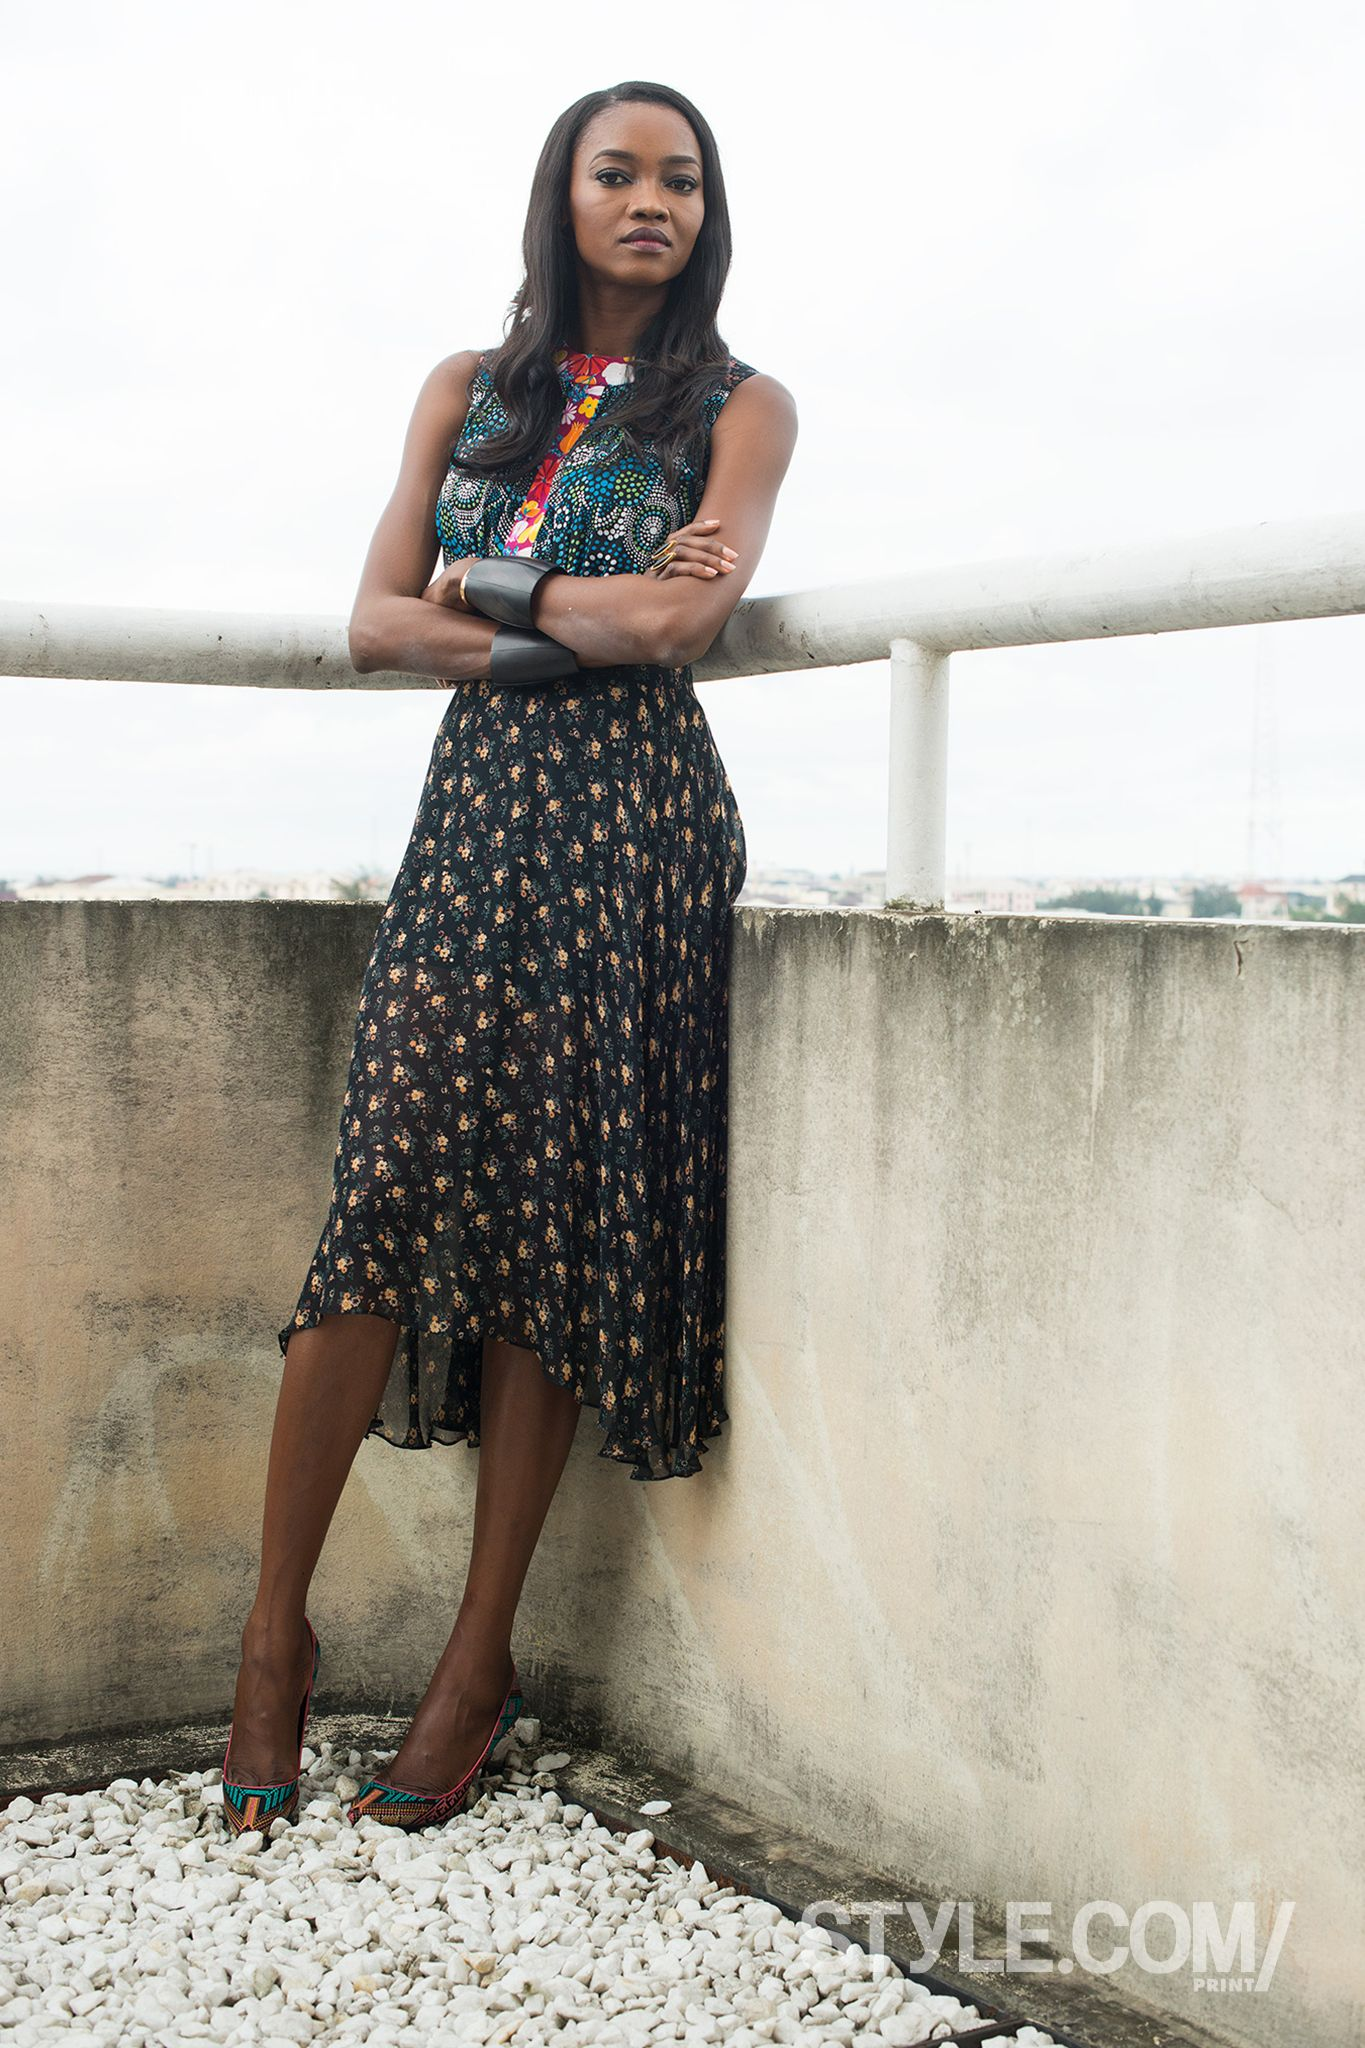 Lagos Rising - Gallery - Style.com